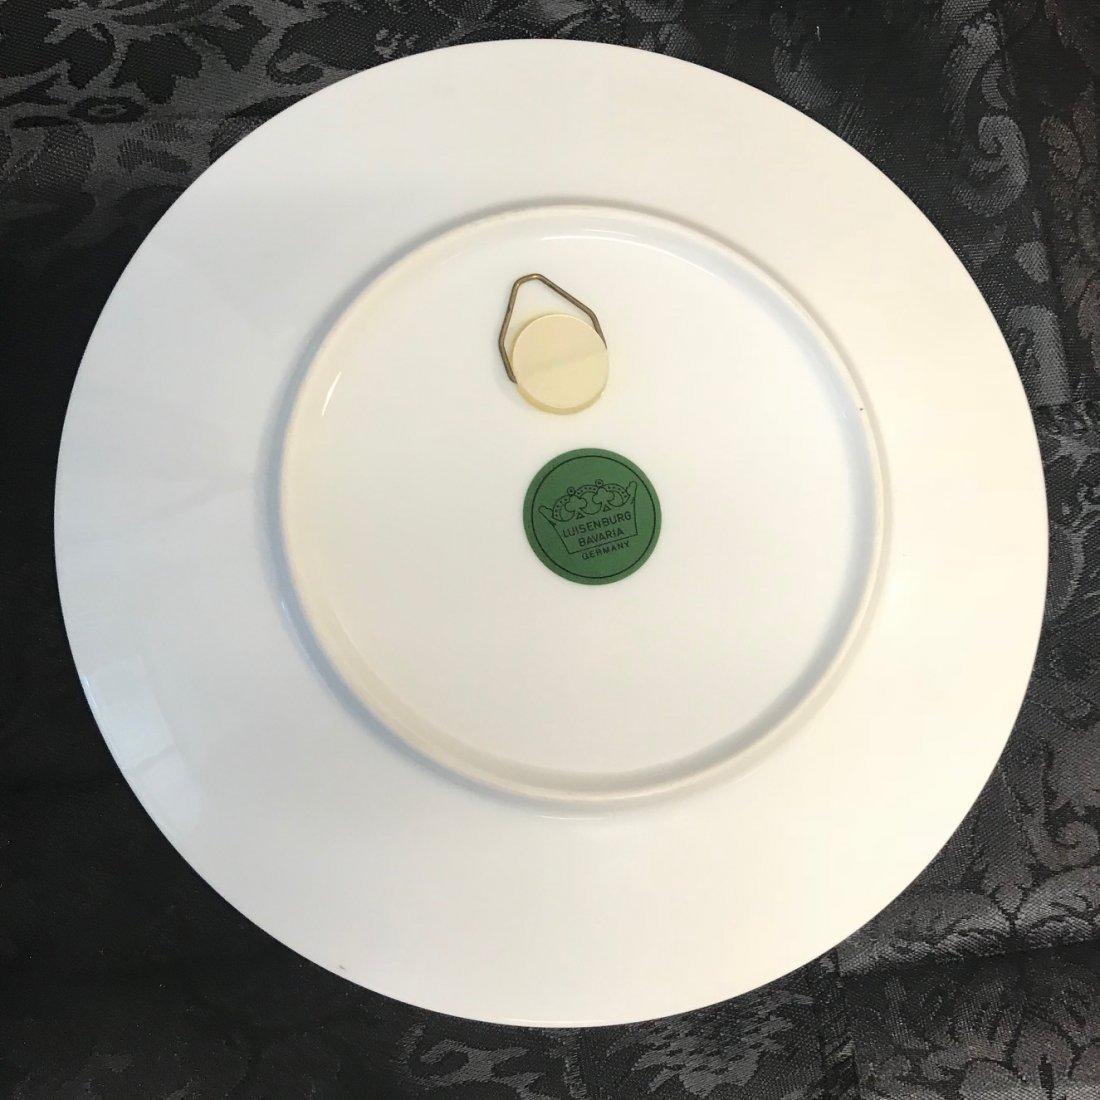 Bavarian Luisenberg Renaissance decorated plate - 2